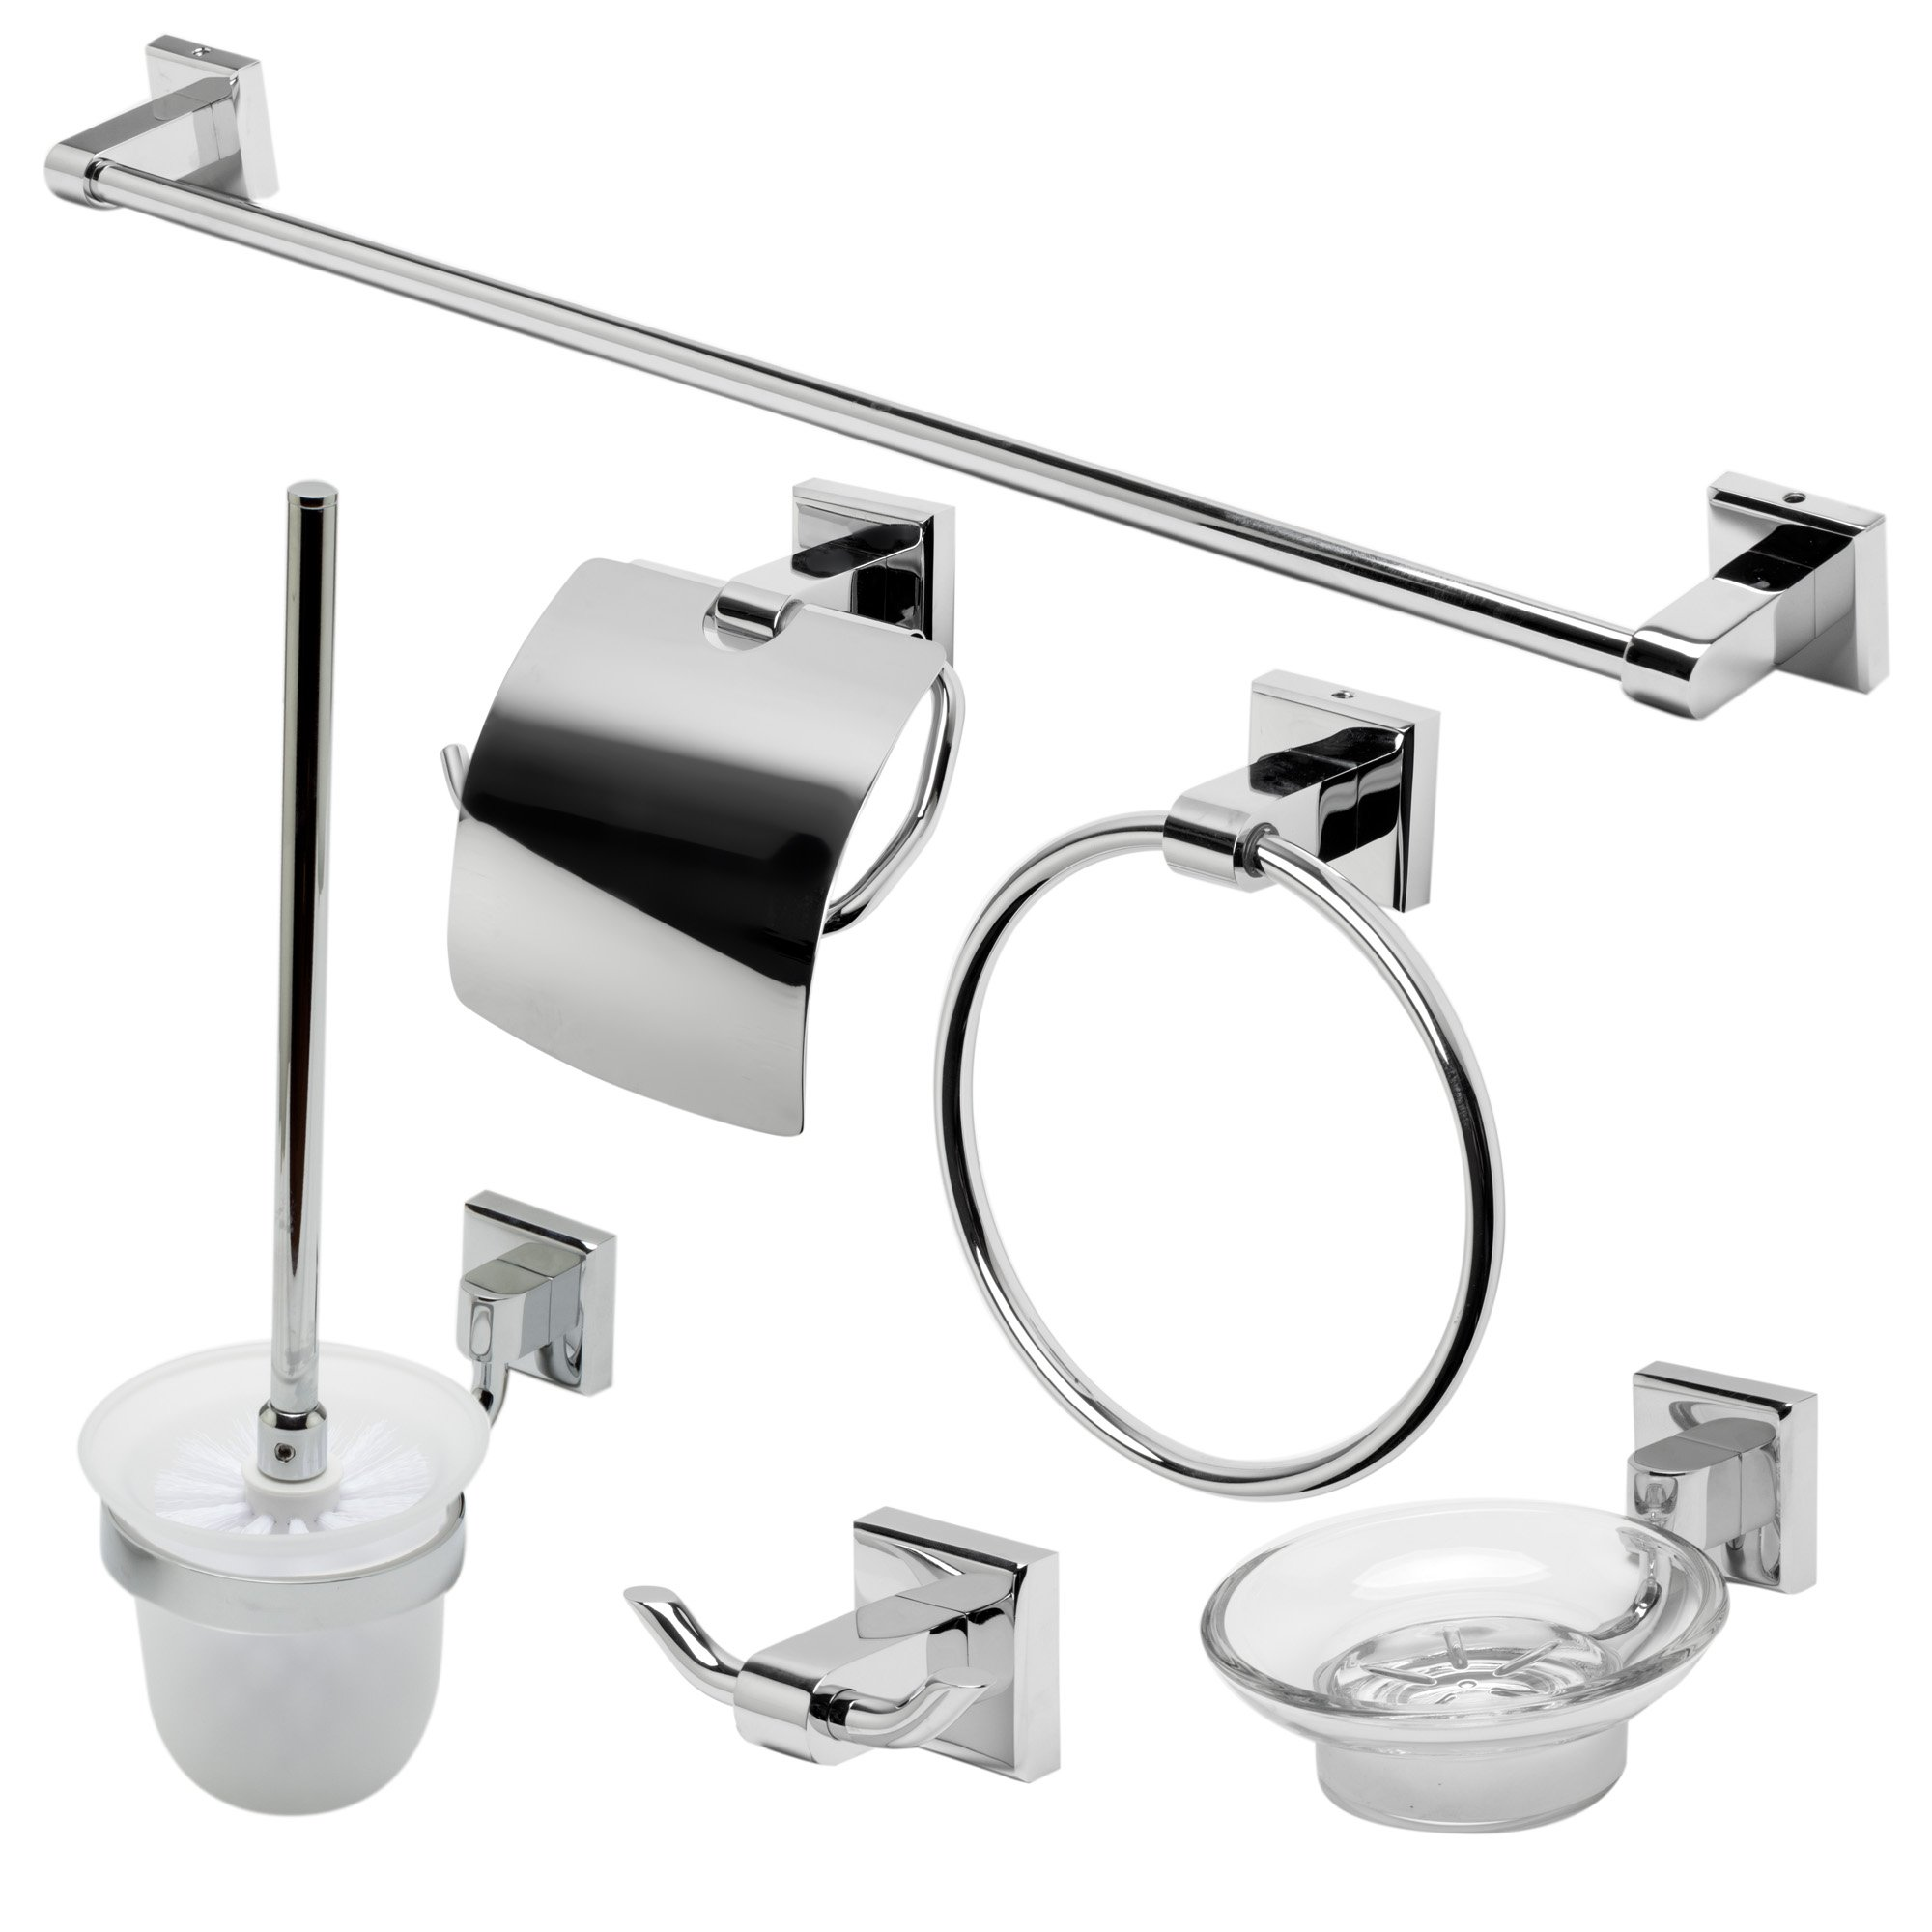 ALFI brand AB9509-PC Matching Bathroom Accessory Set (6 Piece), Polished Chrome